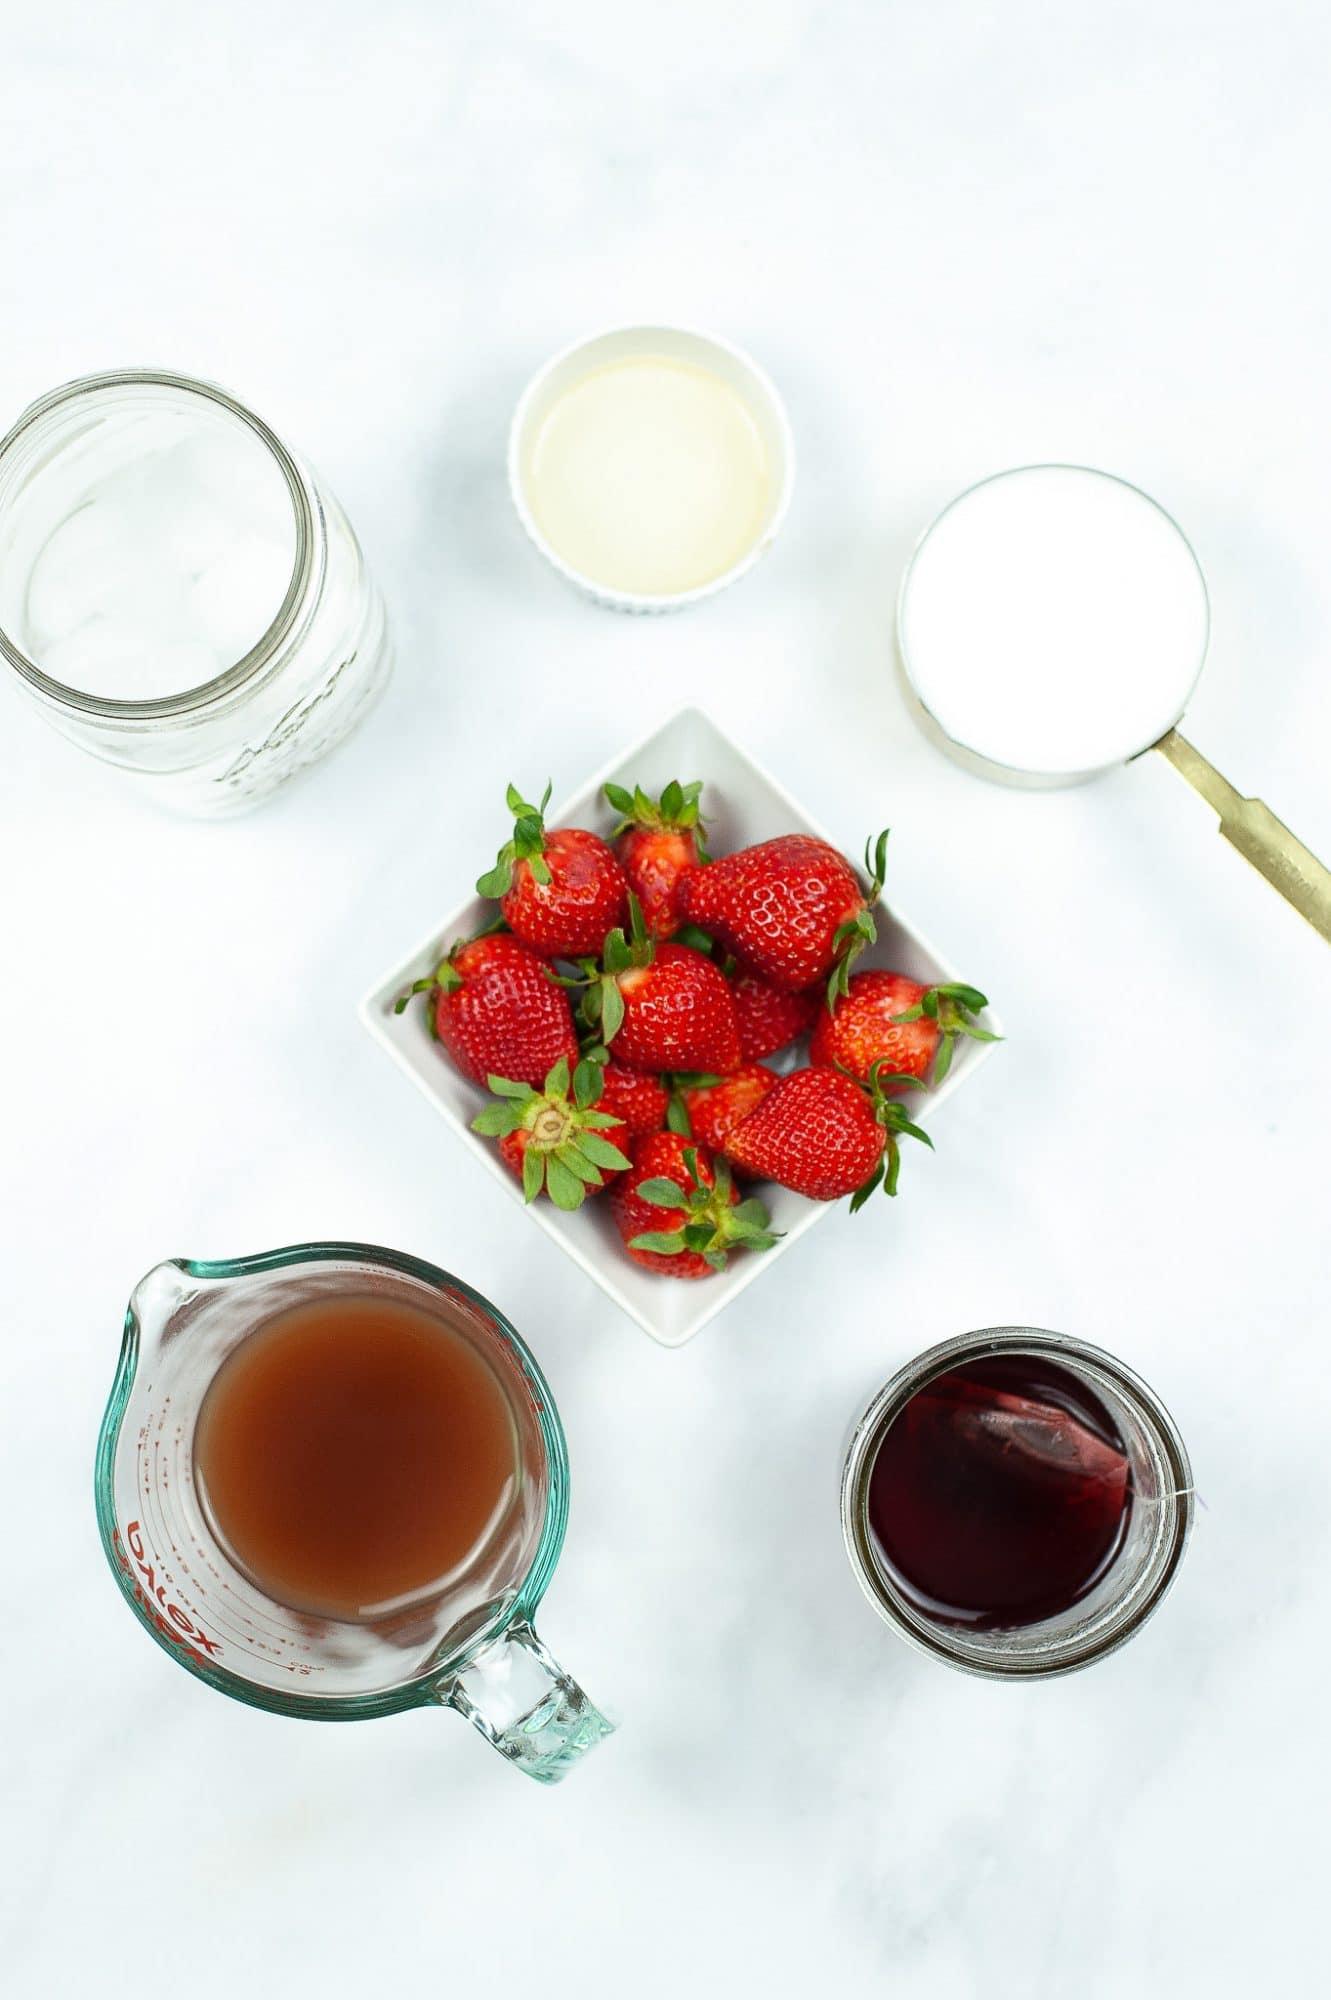 ingredients for starbucks pink drink